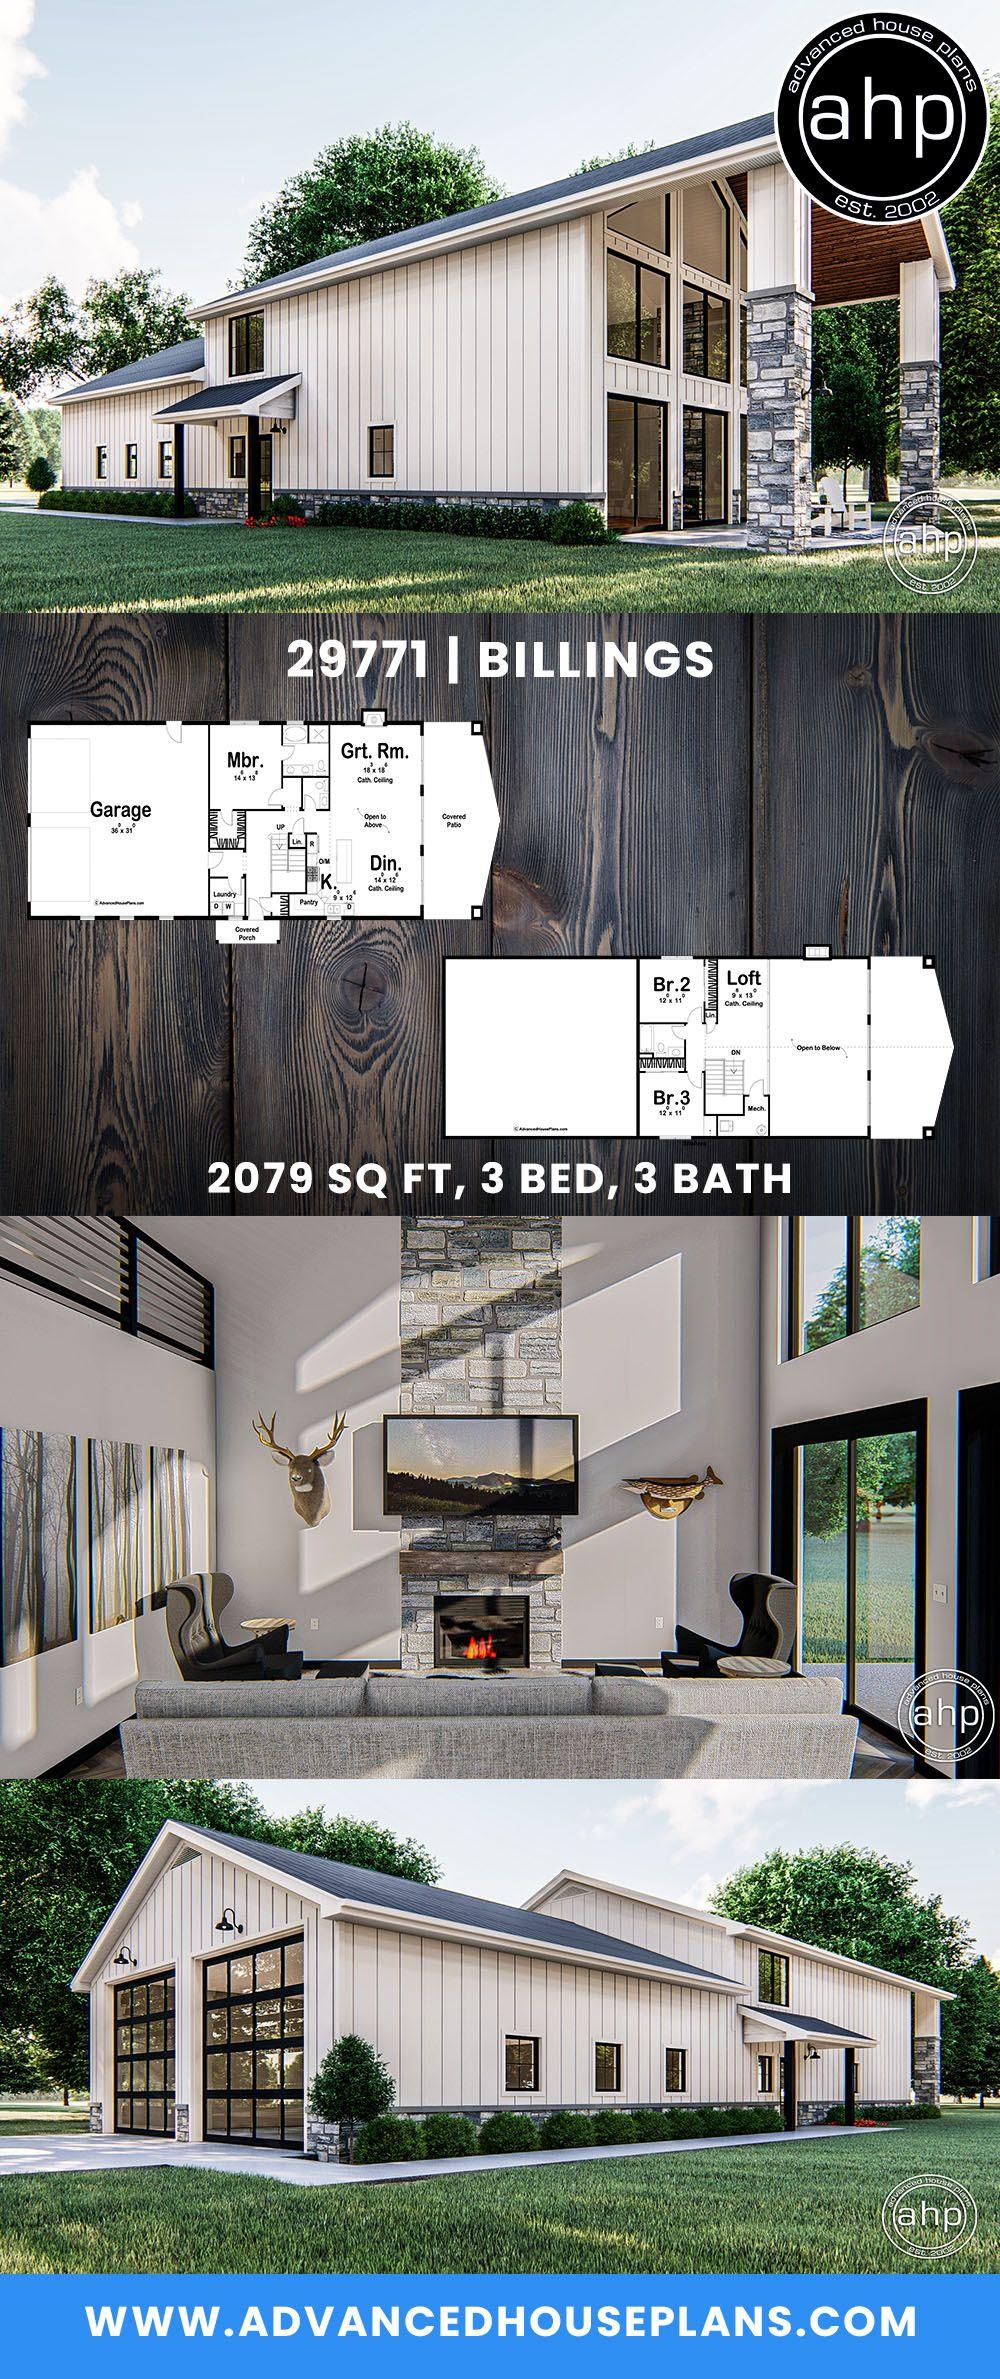 Post Frame Home Barndominium Plan Billings Barndominium Plans Barn House Plans House Plans Farmhouse